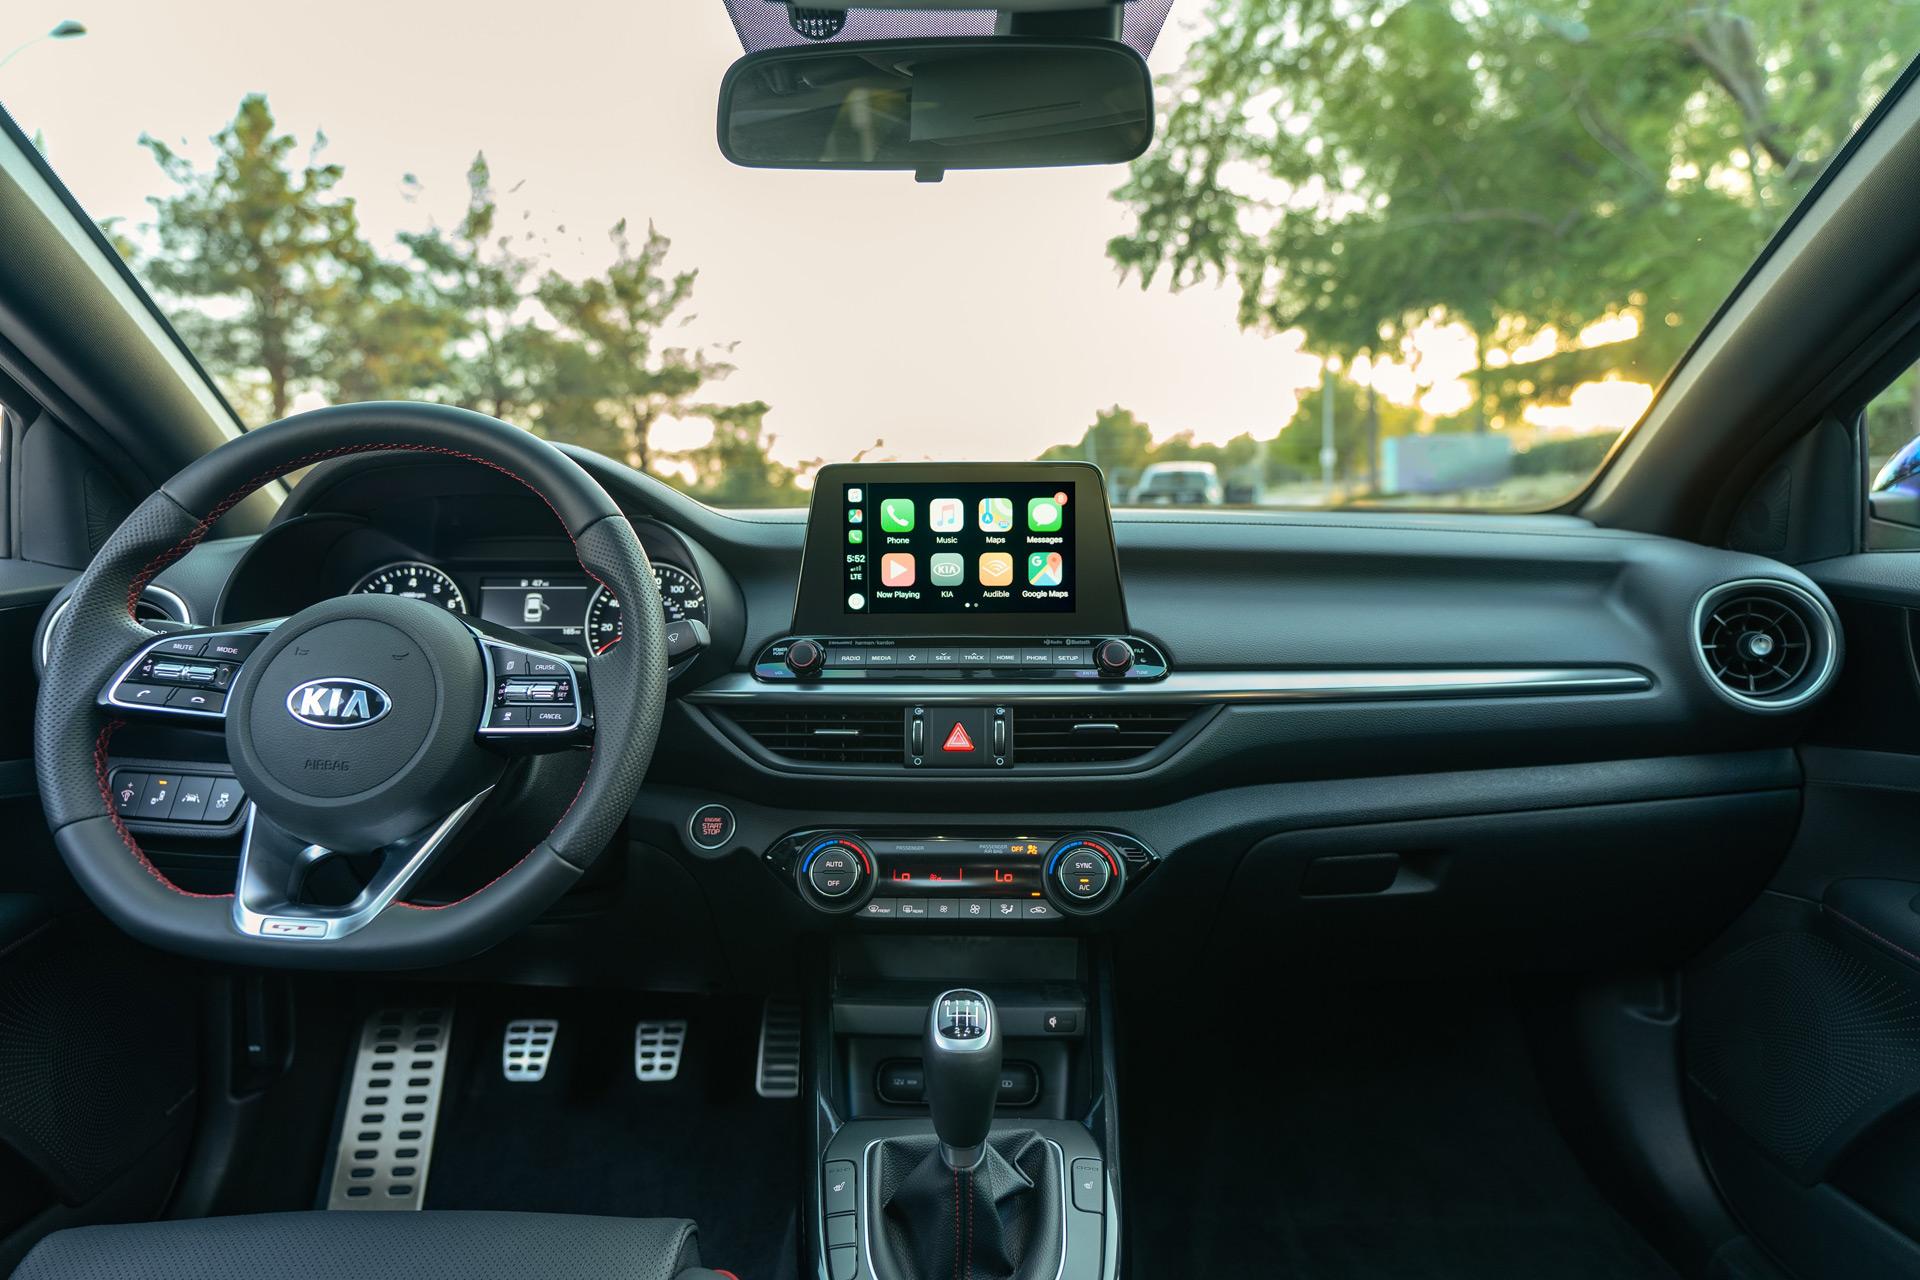 Kia Forte 2020 Review.2020 Kia Forte Review Ratings Specs Prices And Photos